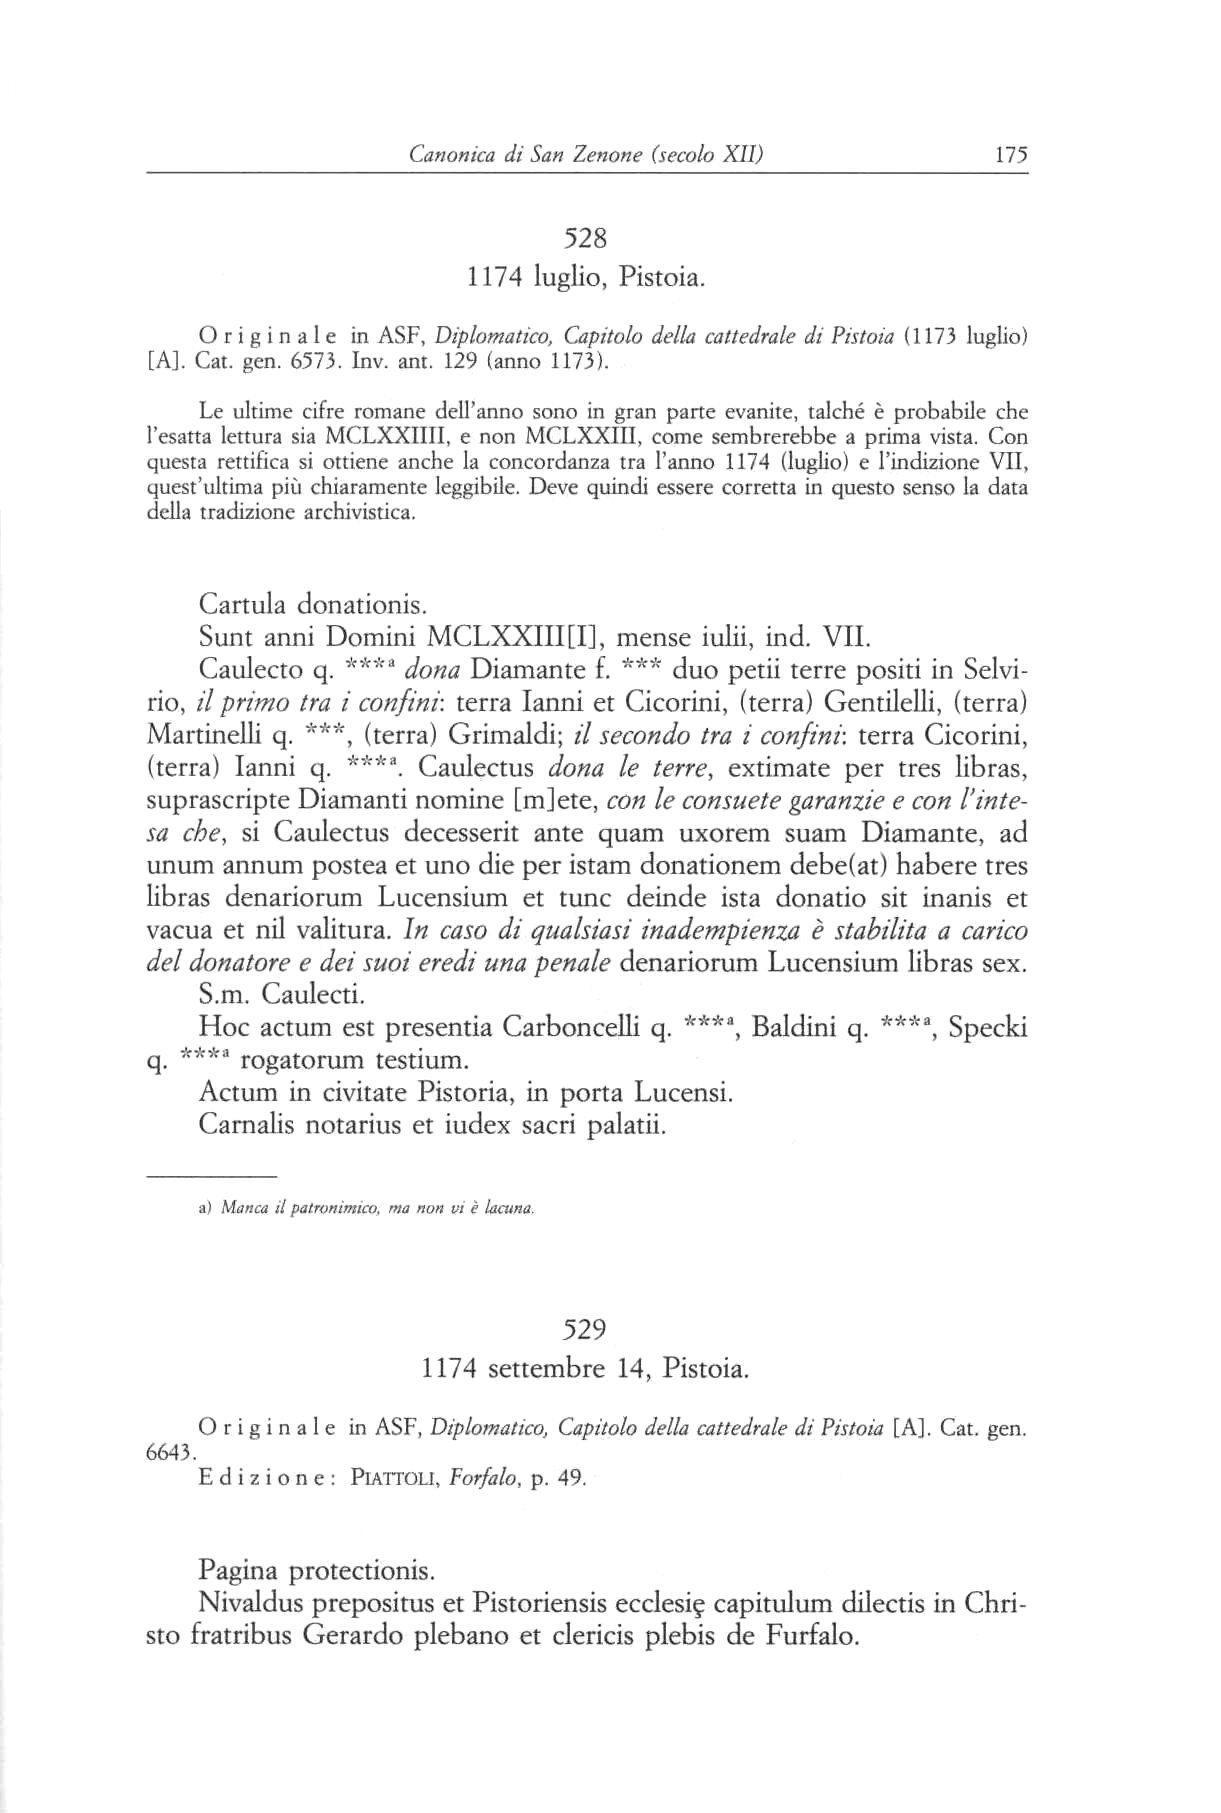 Canonica S. Zenone XII 0175.jpg